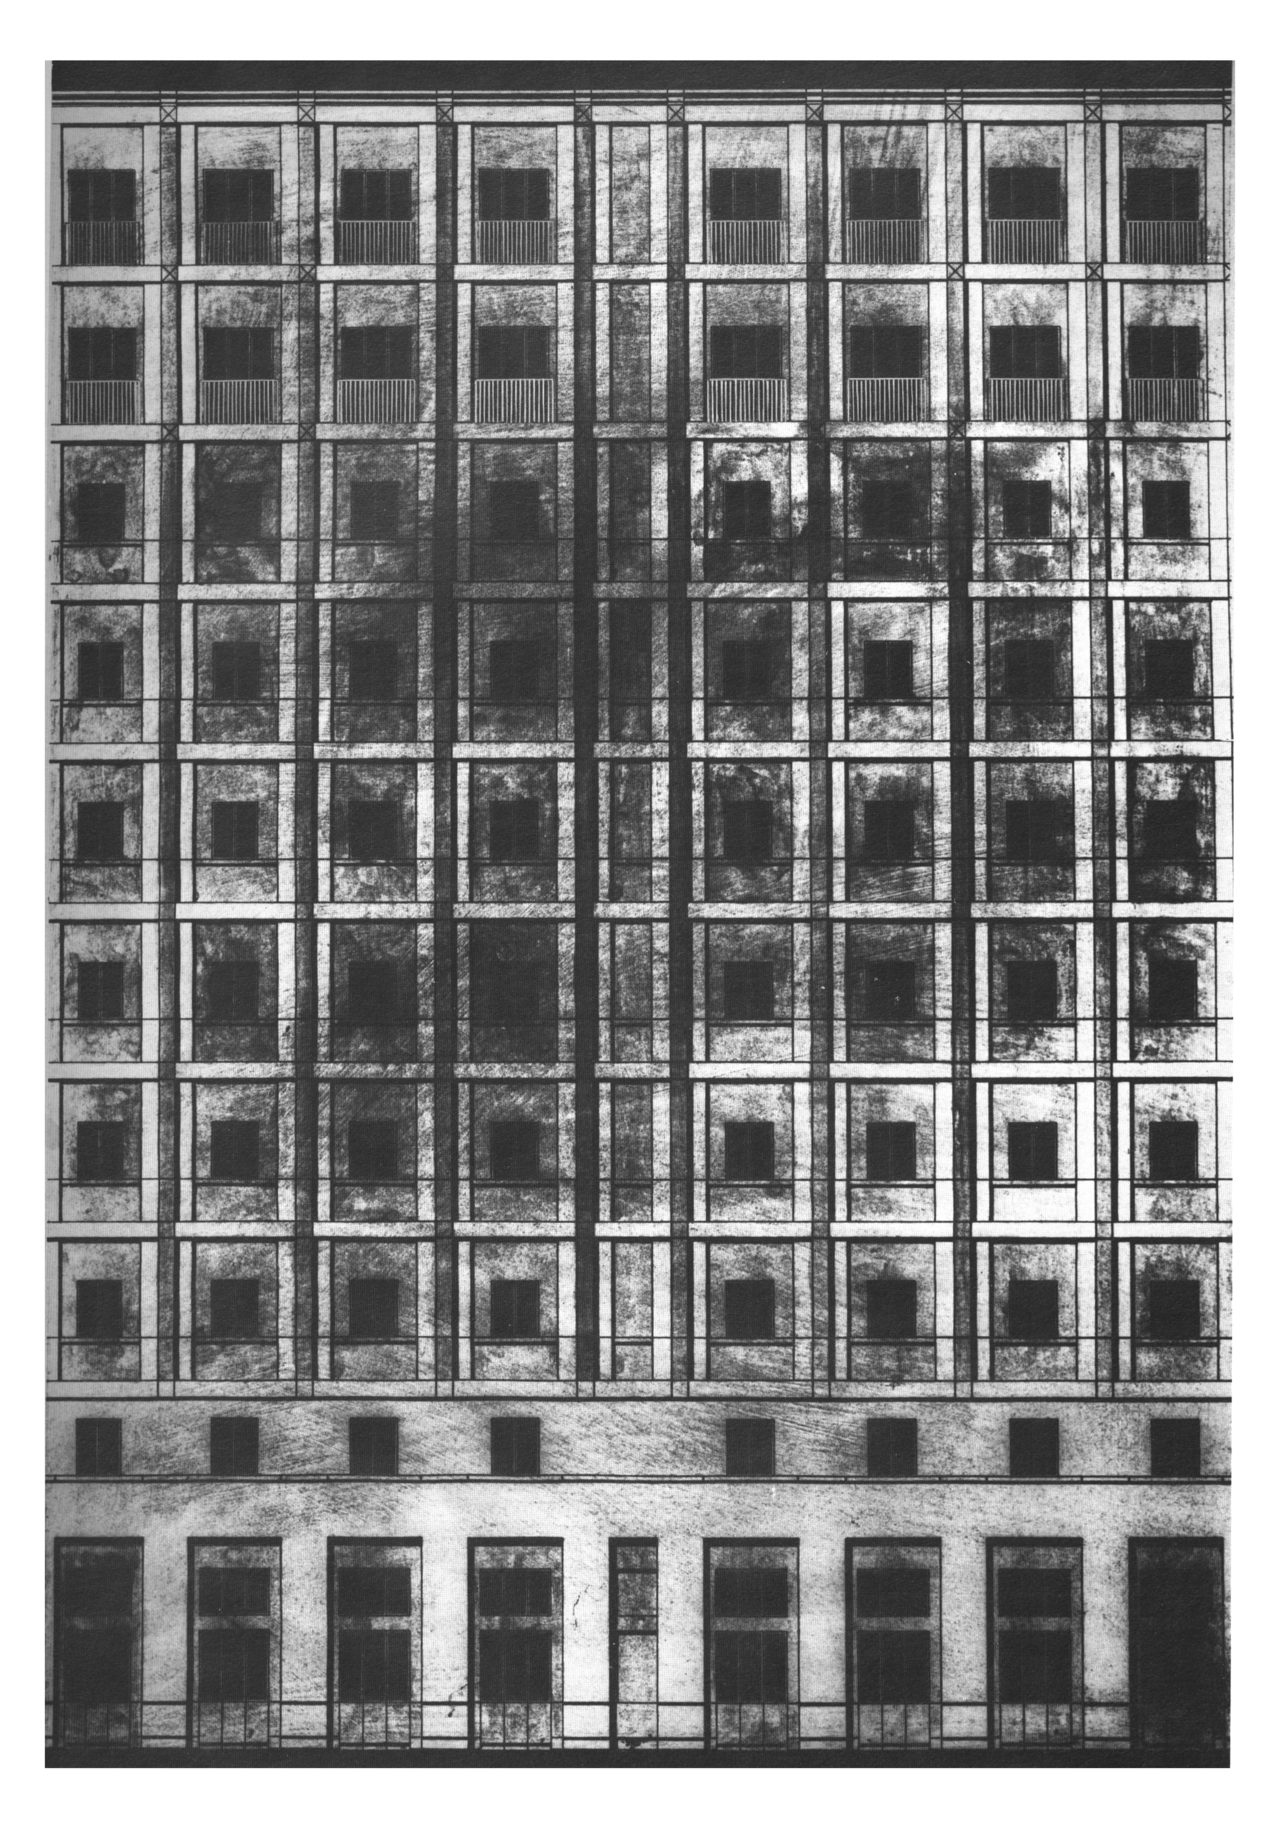 Project for Lungotevere Flaminio and Piazza Mancini Dario Passi 1981.jpg